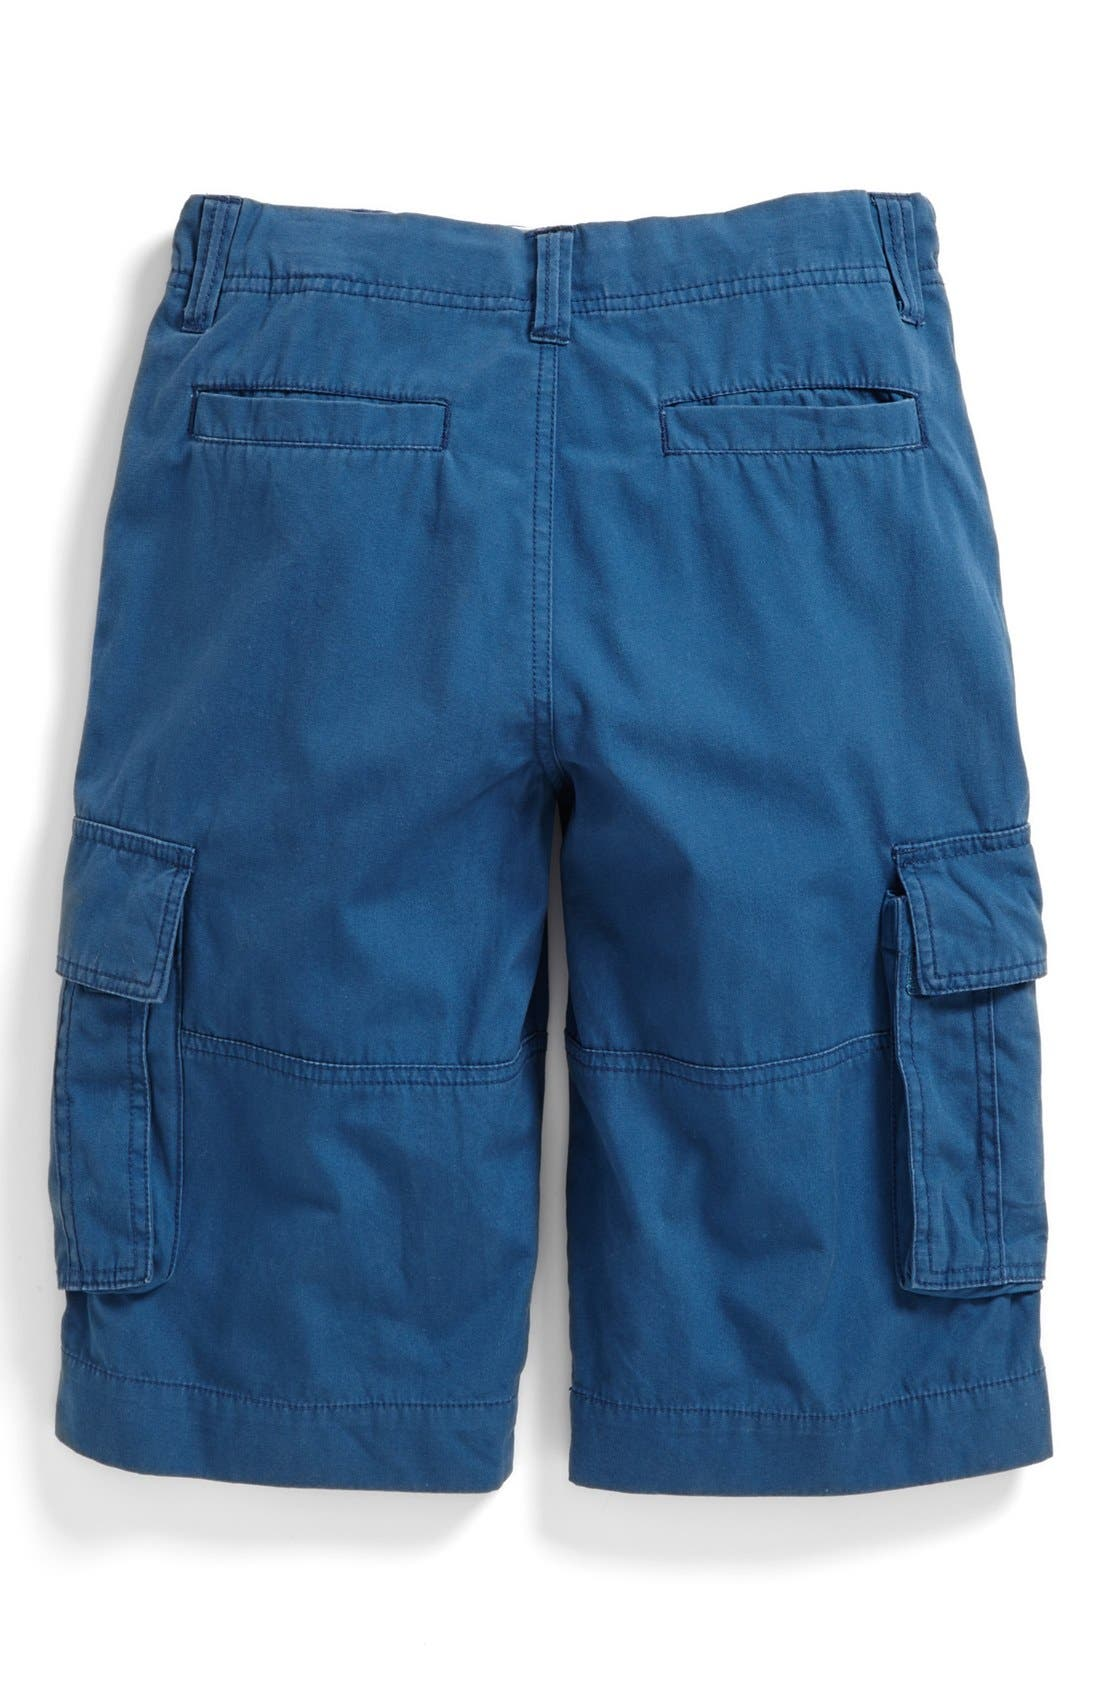 Alternate Image 2  - Tucker + Tate Cargo Shorts (Big Boys)